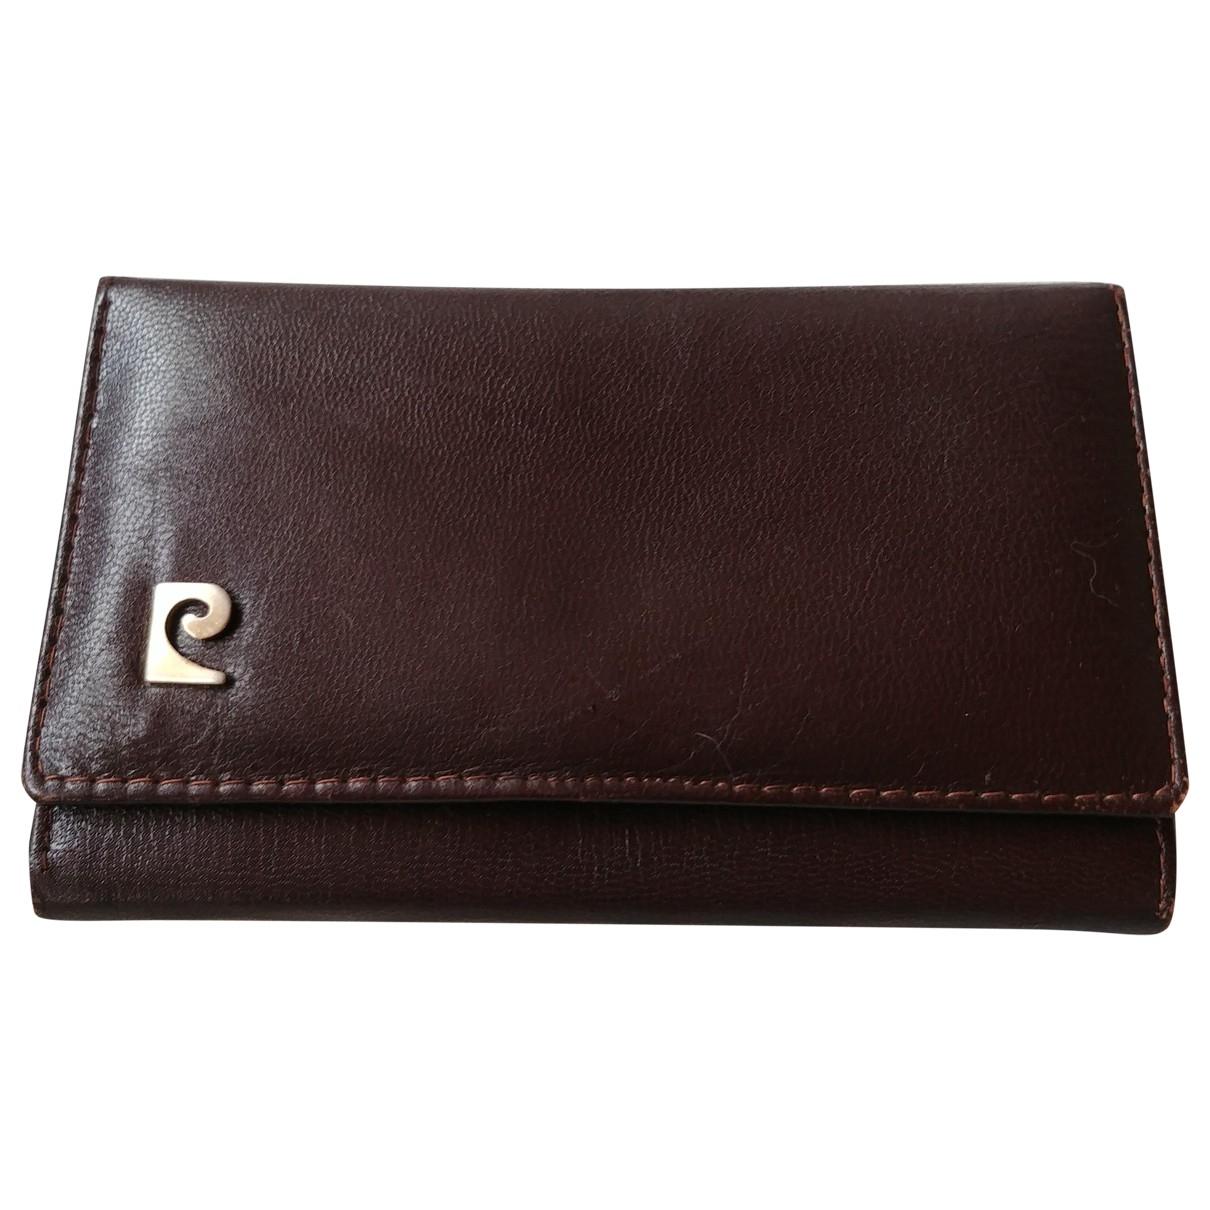 Pierre Cardin \N Brown Leather Purses, wallet & cases for Women \N